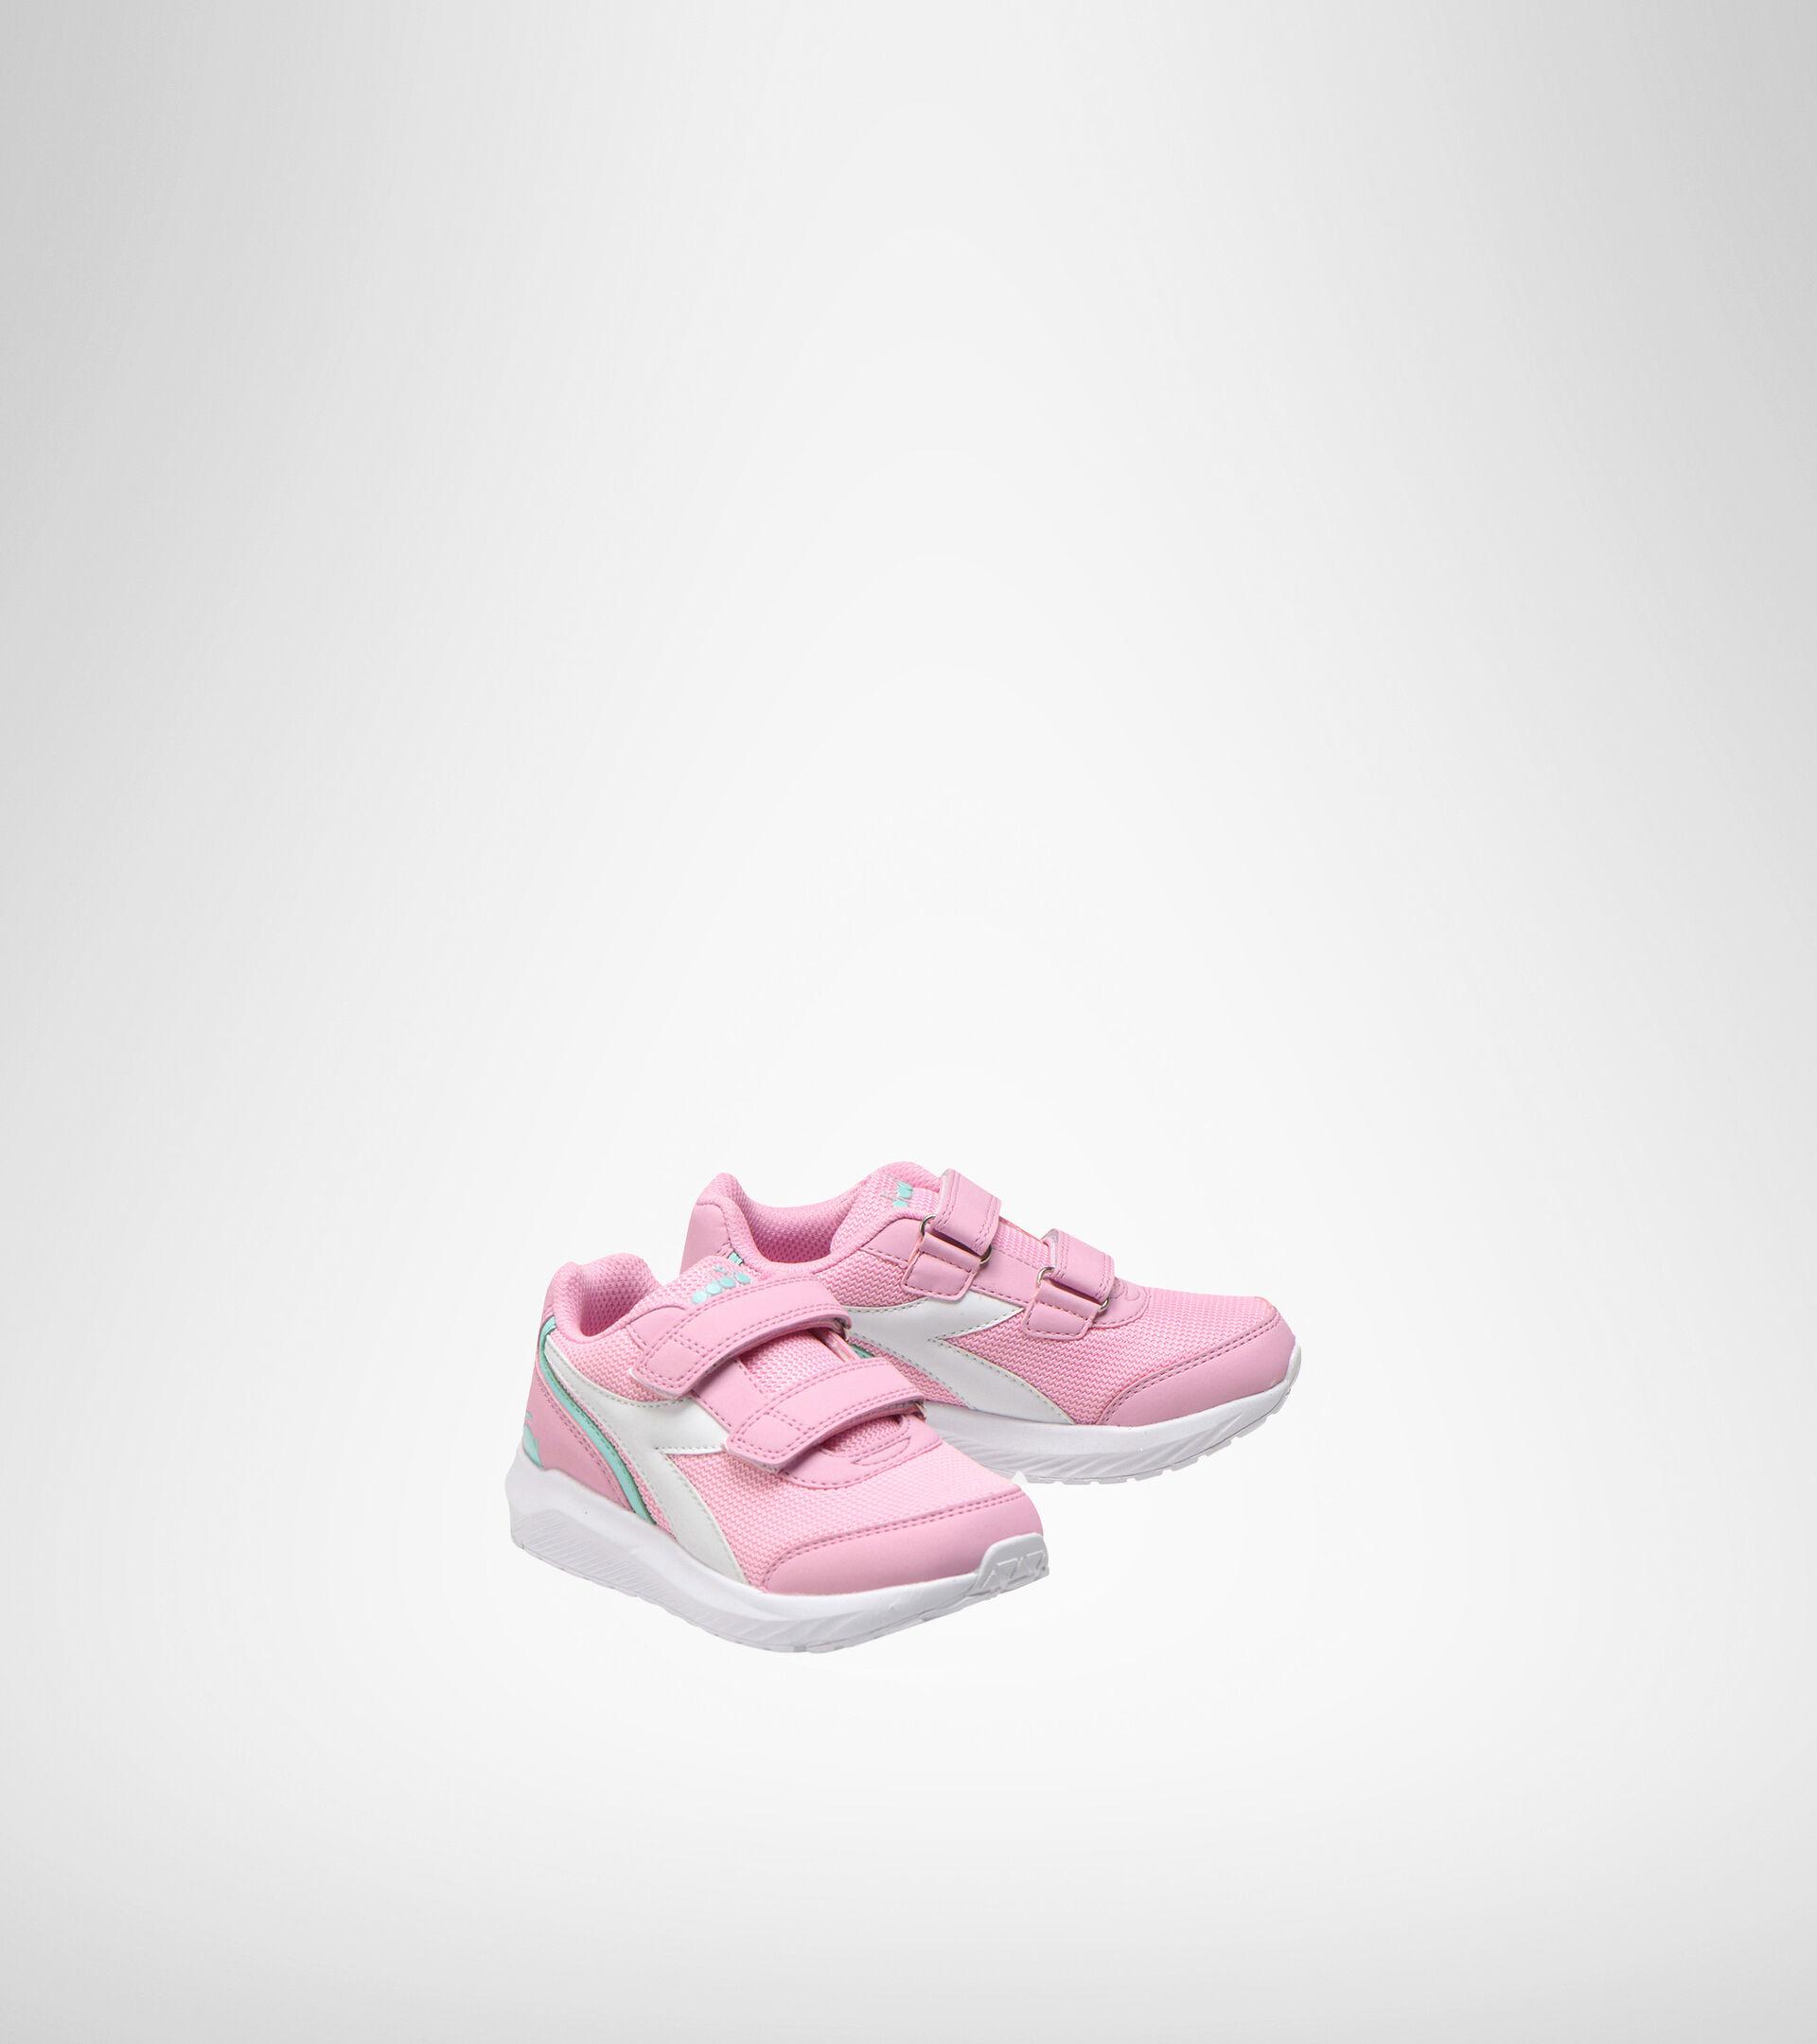 Chaussures de running - Unisexe Enfant FALCON JR V ROSA LADY/BIANCO - Diadora